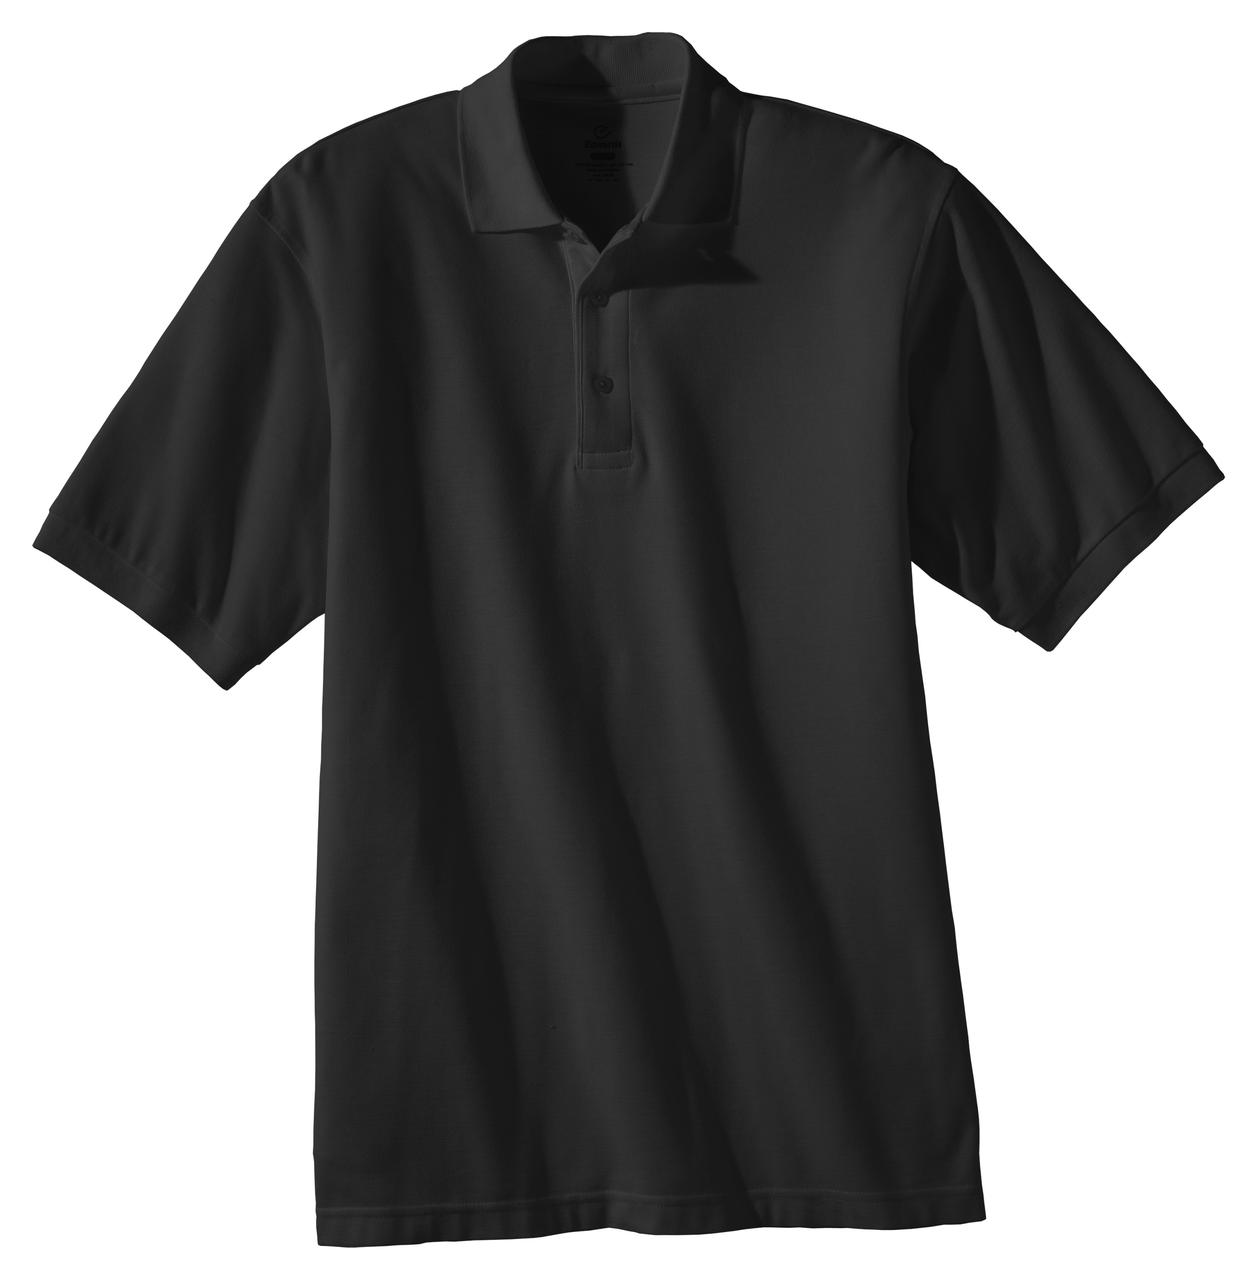 ROYAL Ed Garments Short Sleeve Pique Polo Pocket Shirt Large